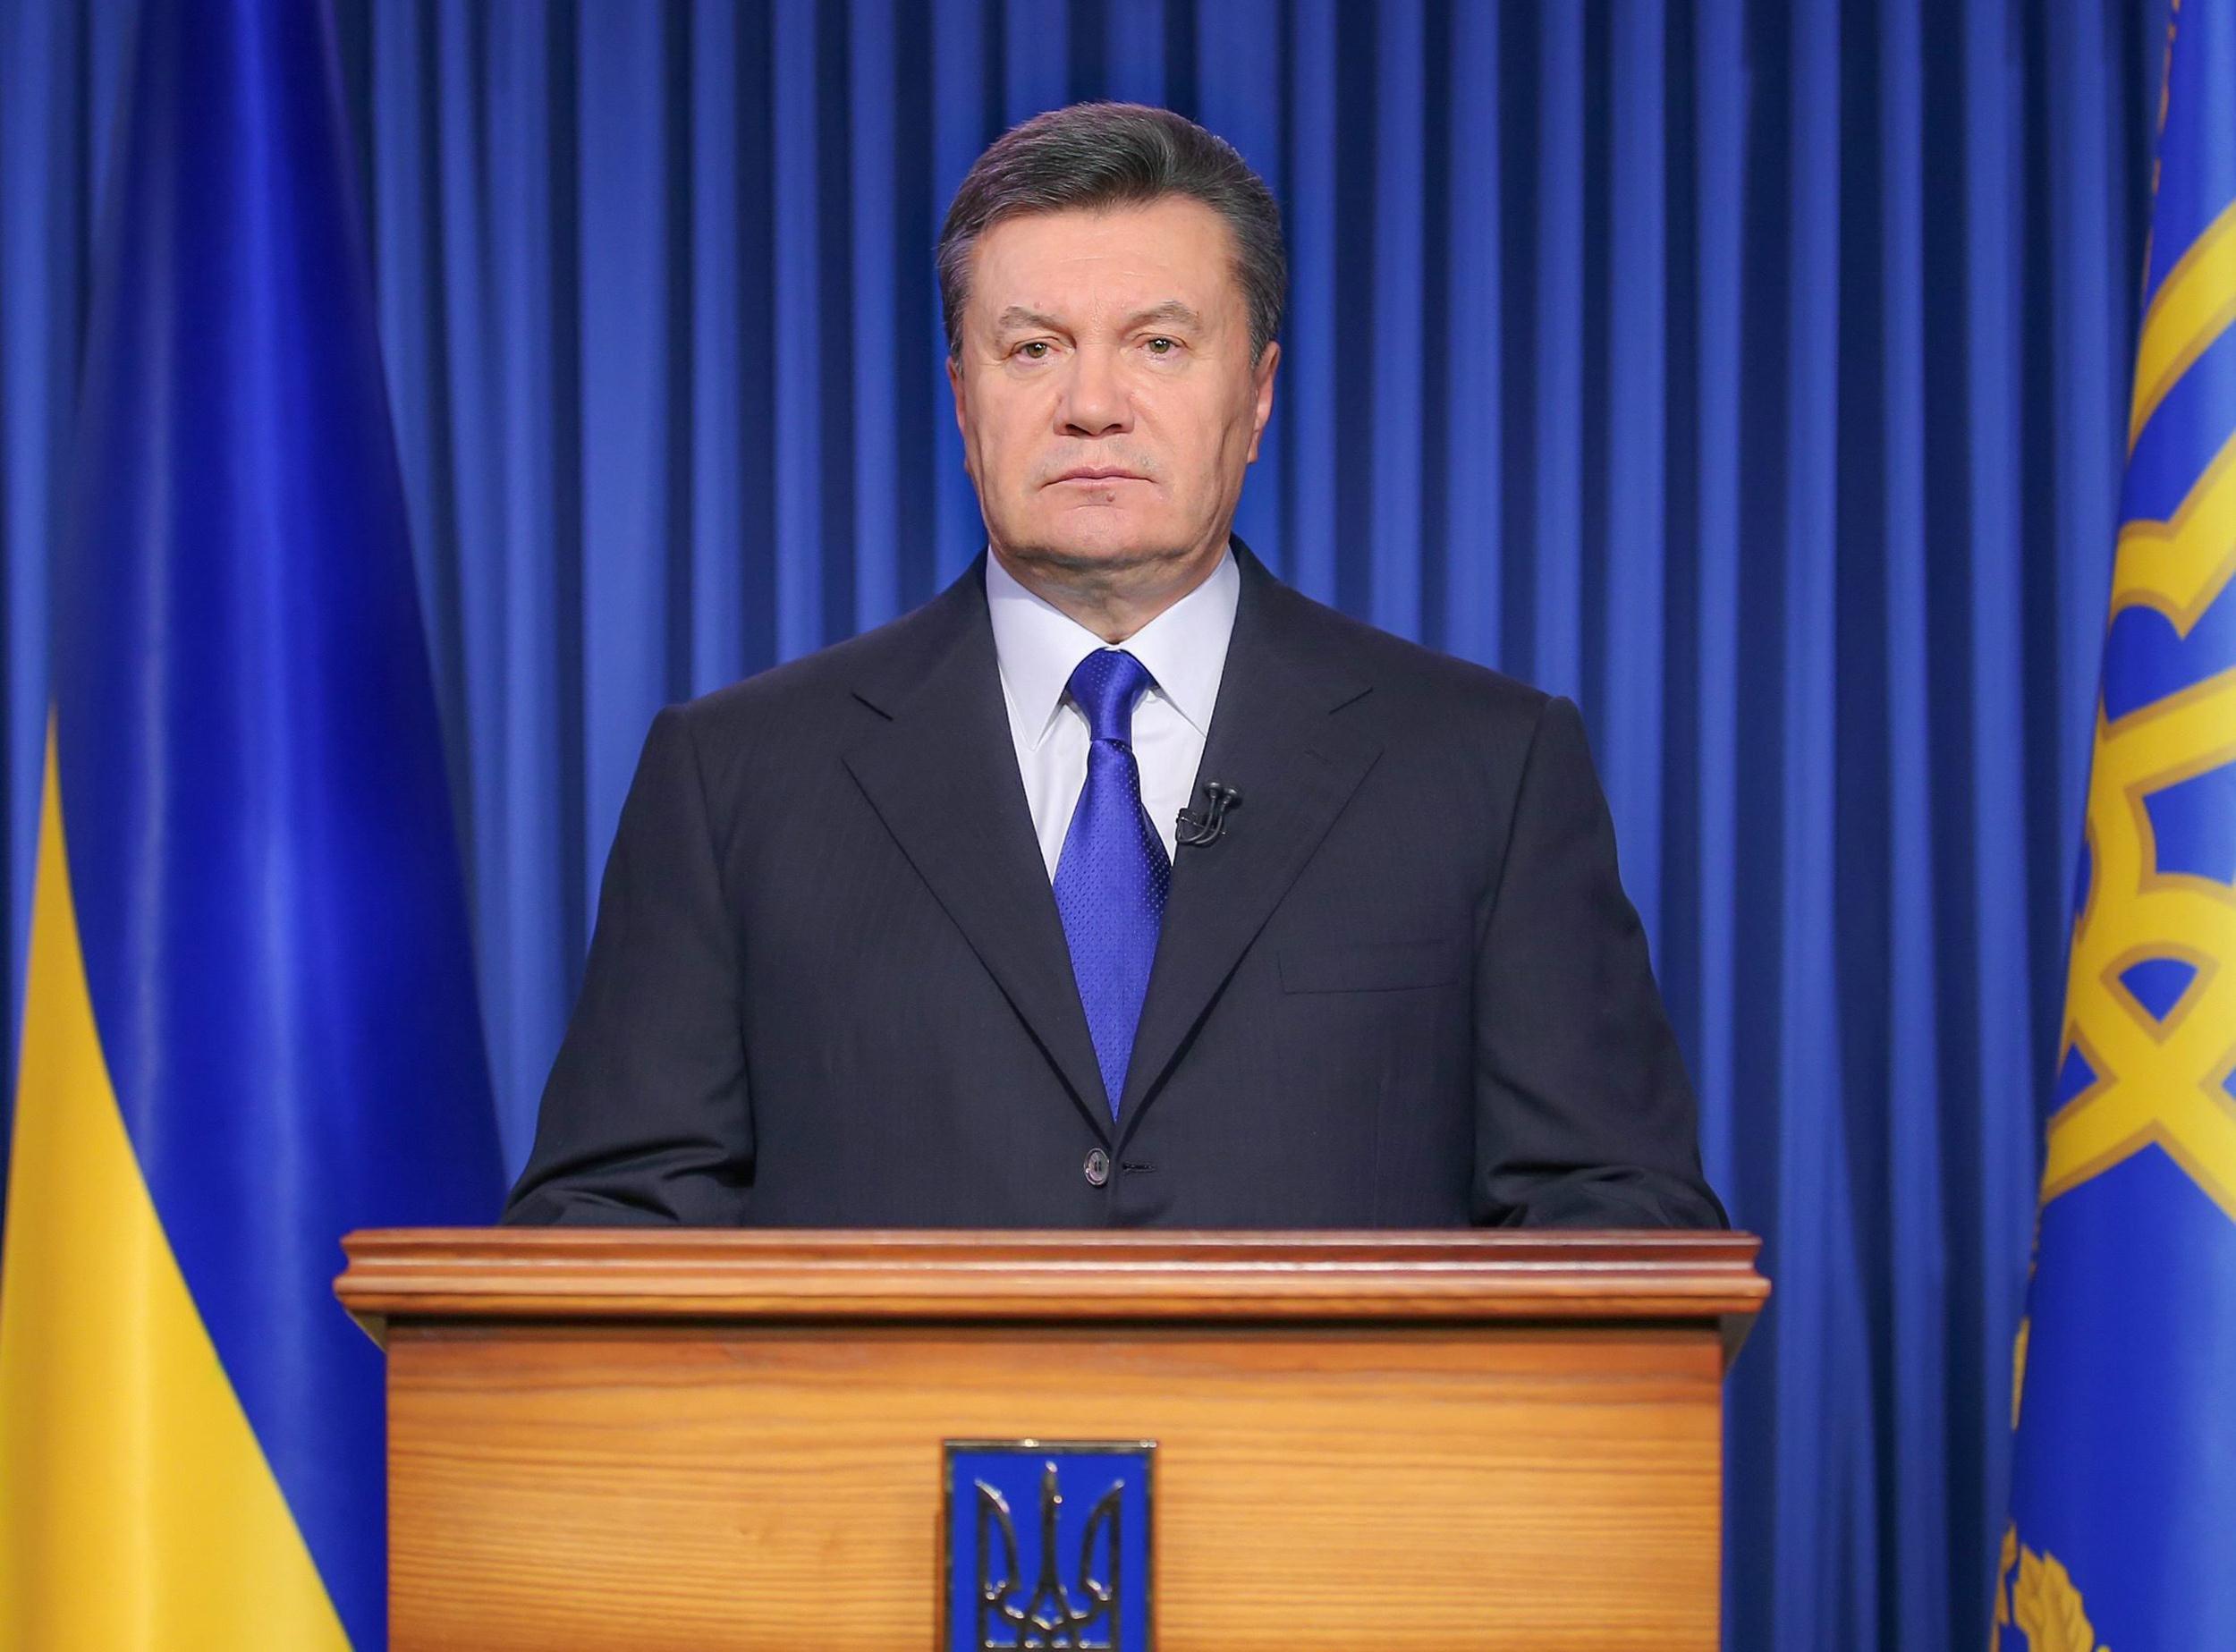 Image: Ukrainian President Viktor Yanukovych